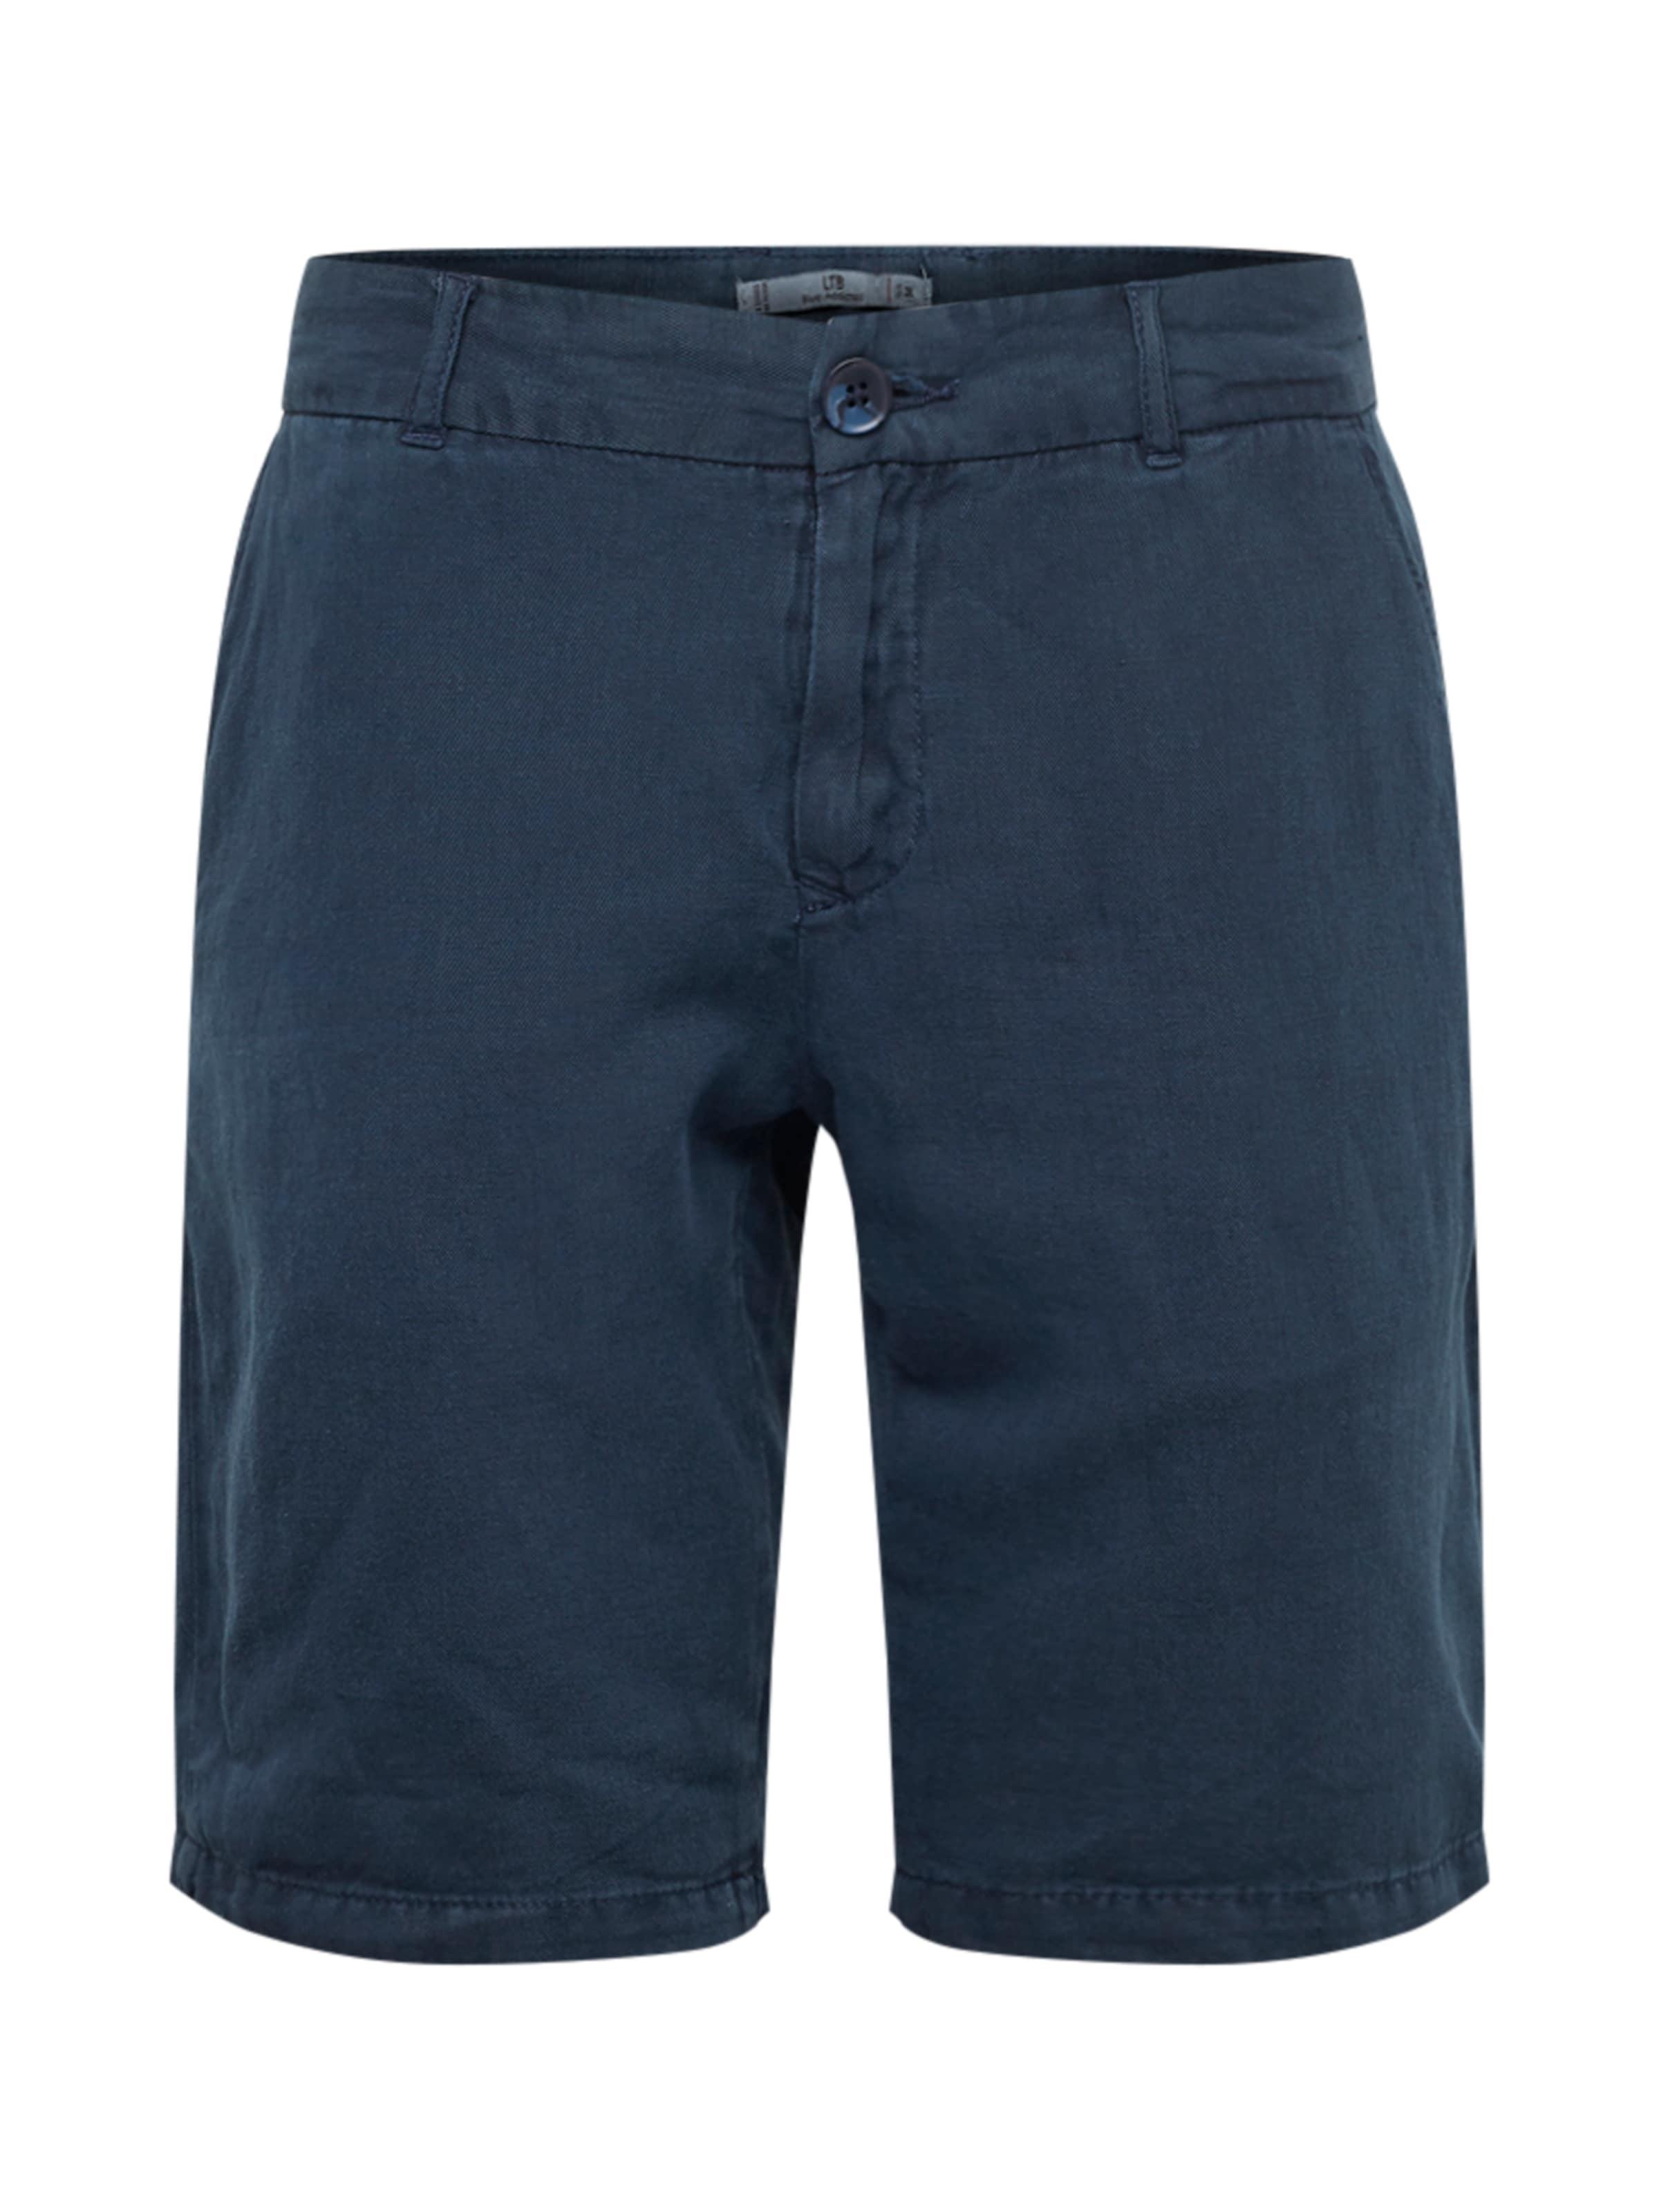 Pantalon Marine Bleu Ltb En 'mitaja' nwO08kP